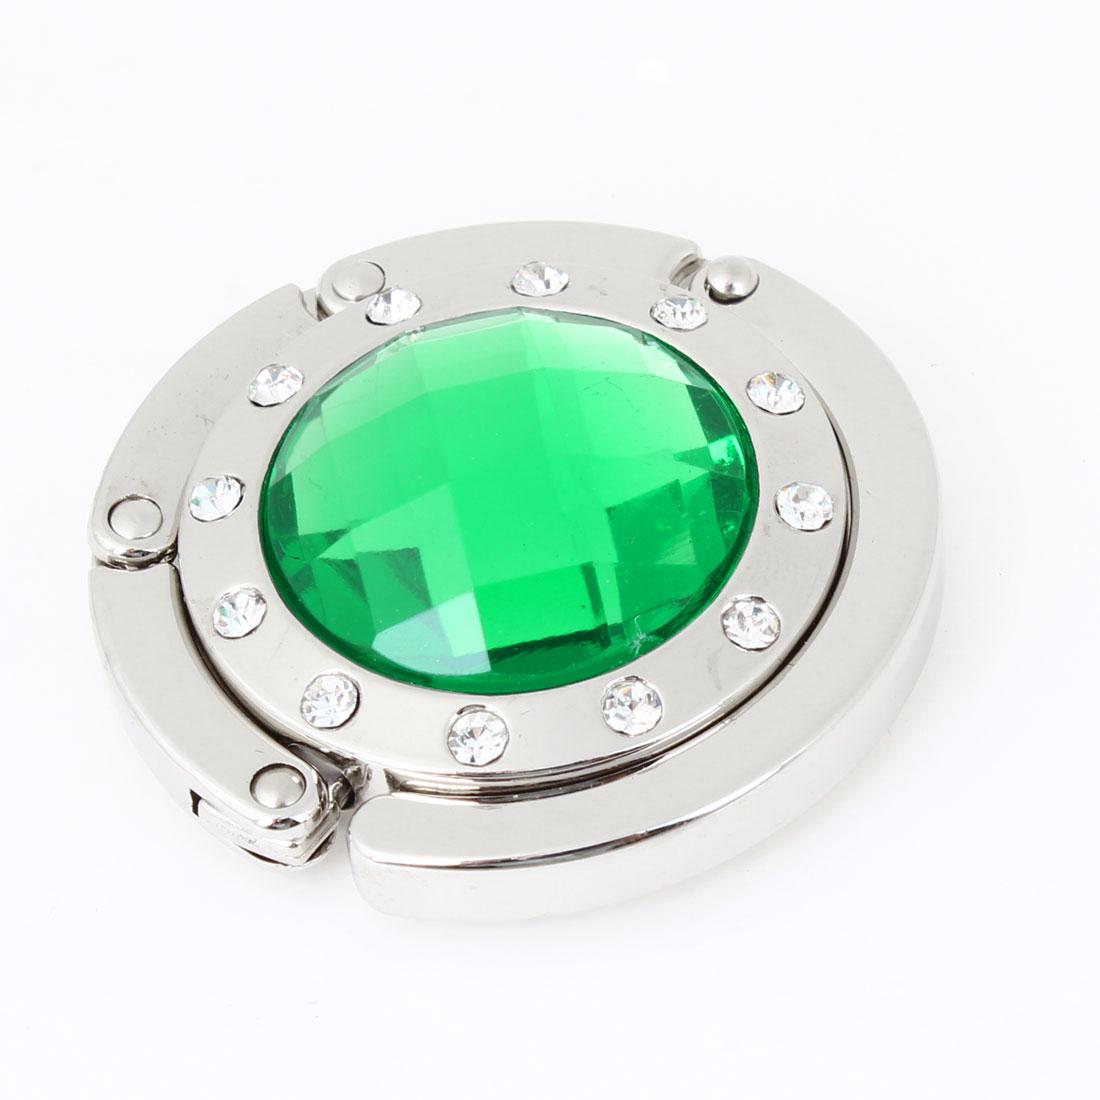 Lady Green Faux Crystal Detailing Silver Tone Hook Handbag Hanger